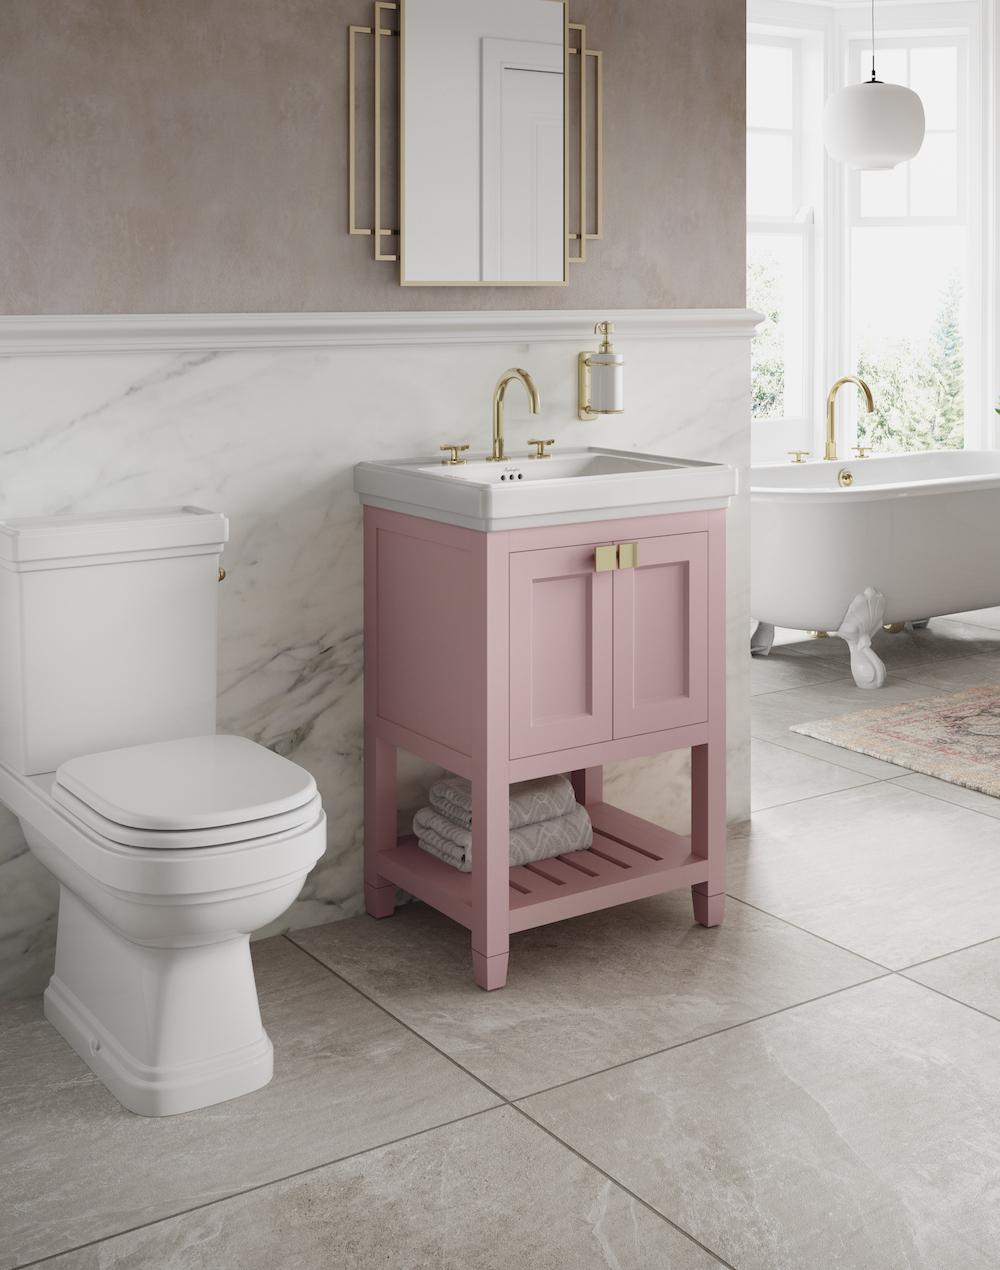 Image of pink bathroom basin from burlington